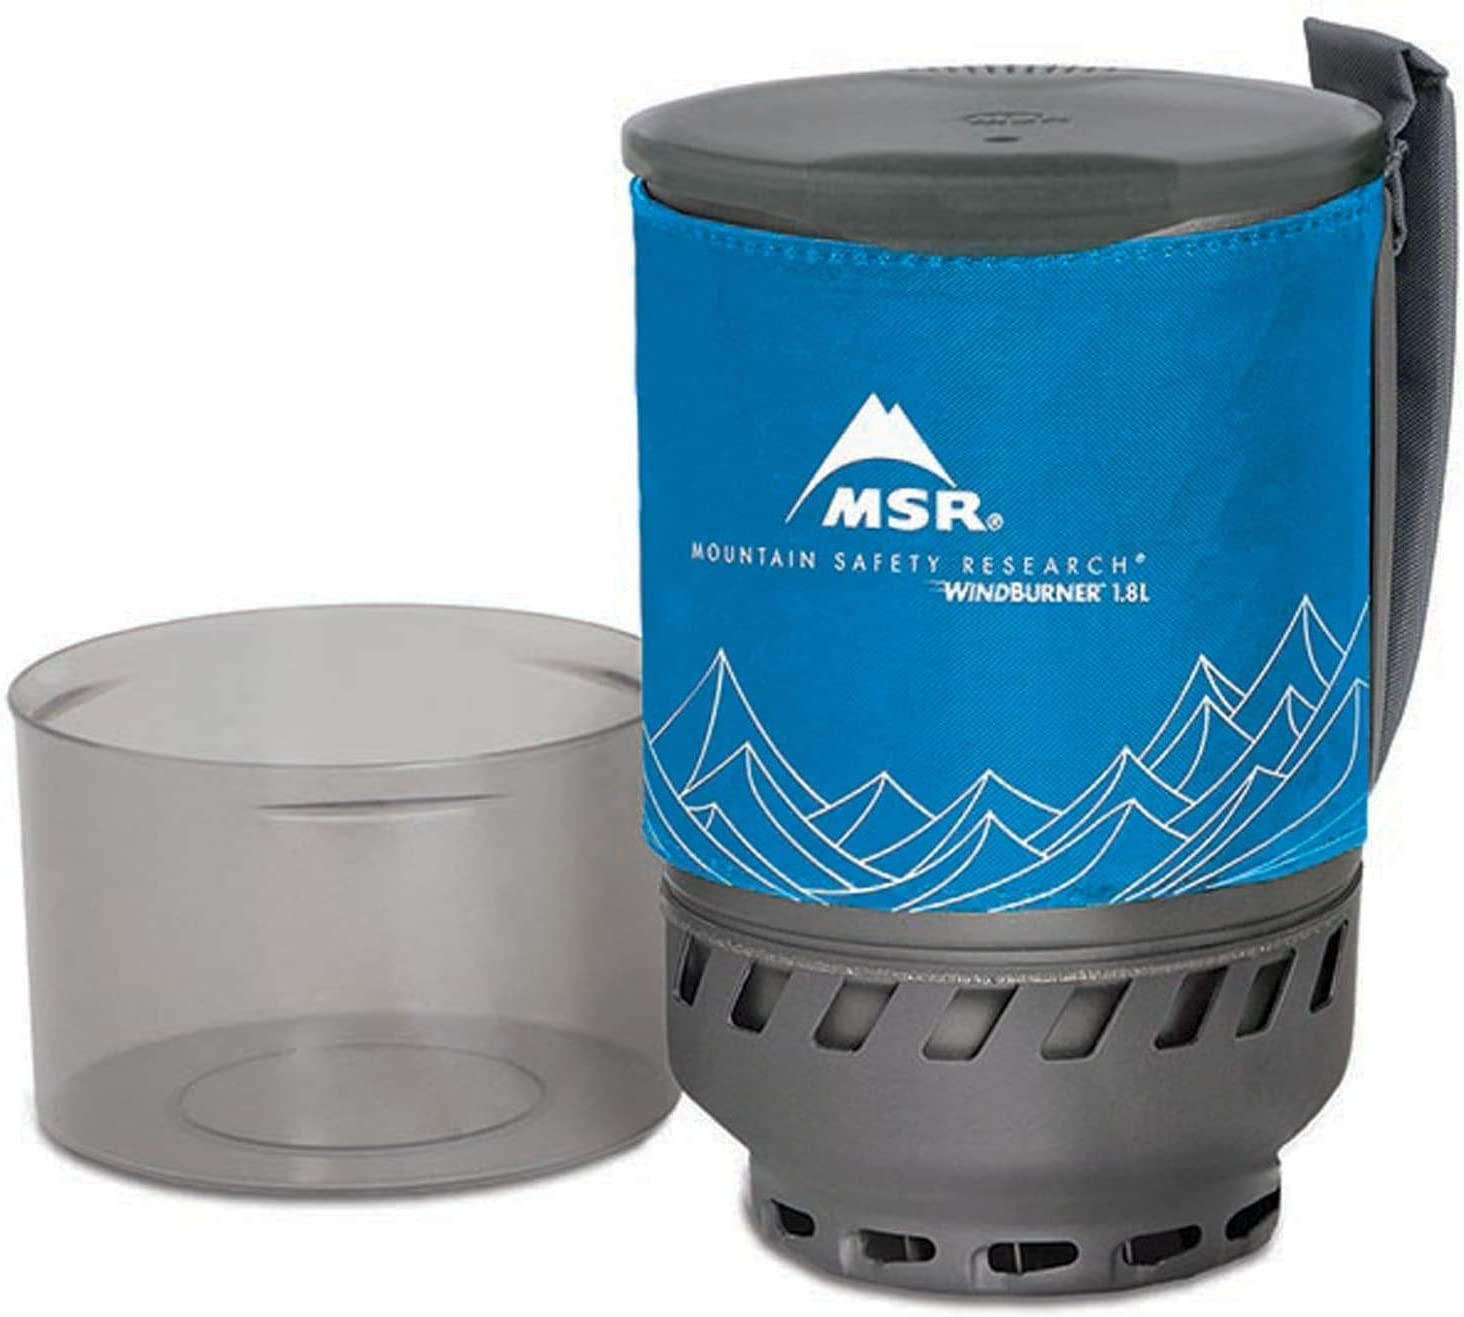 MSR Windburner Duo Accesorio Pot 1.8l